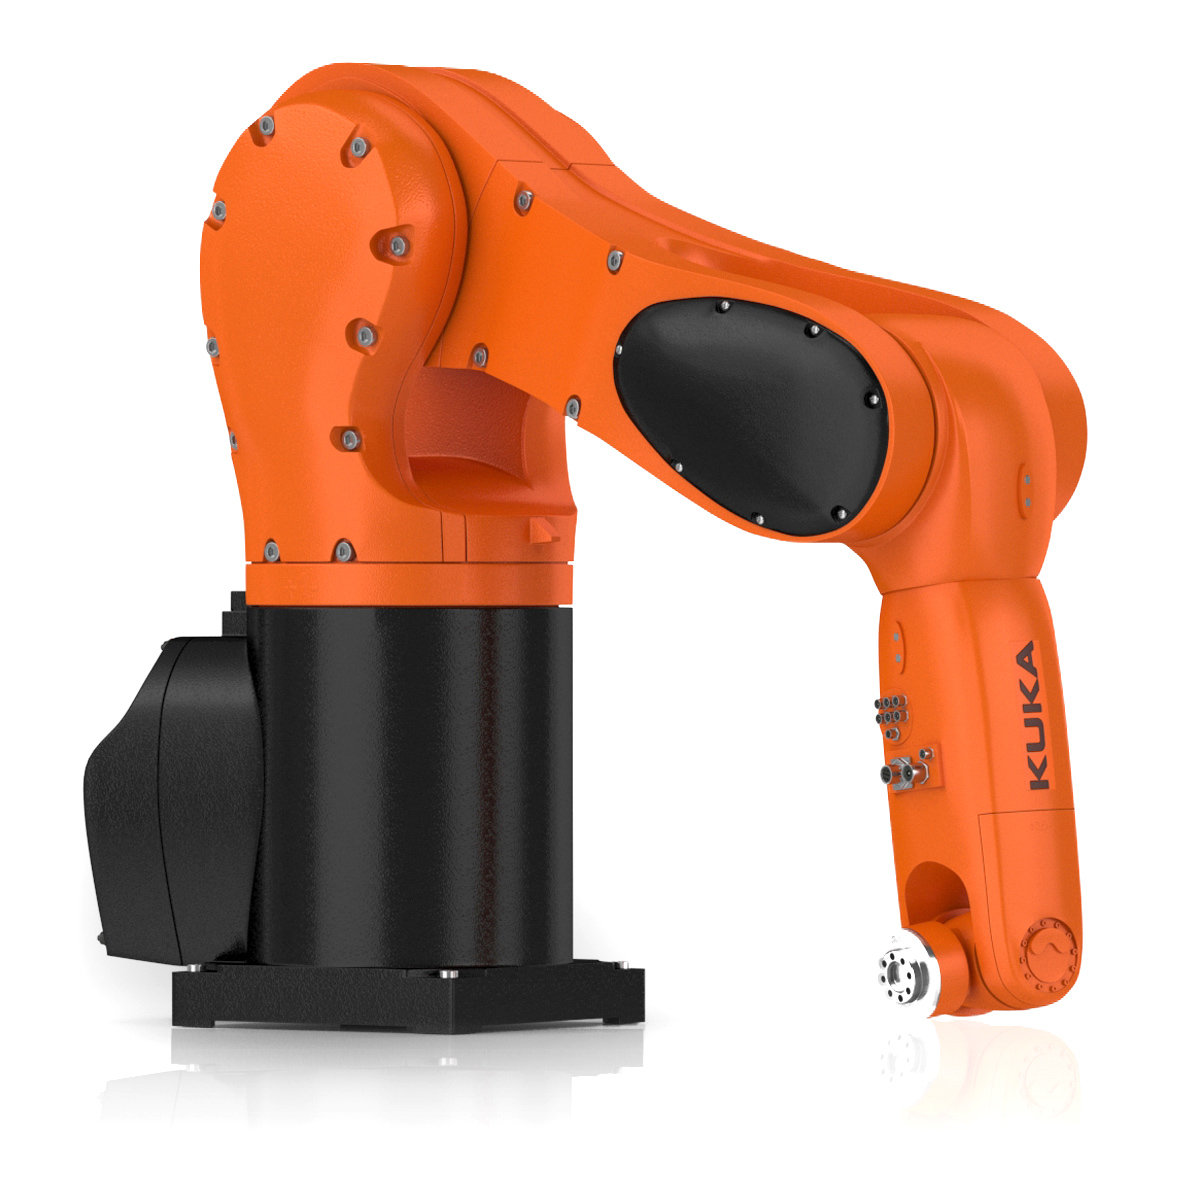 3D rigged kuka r900